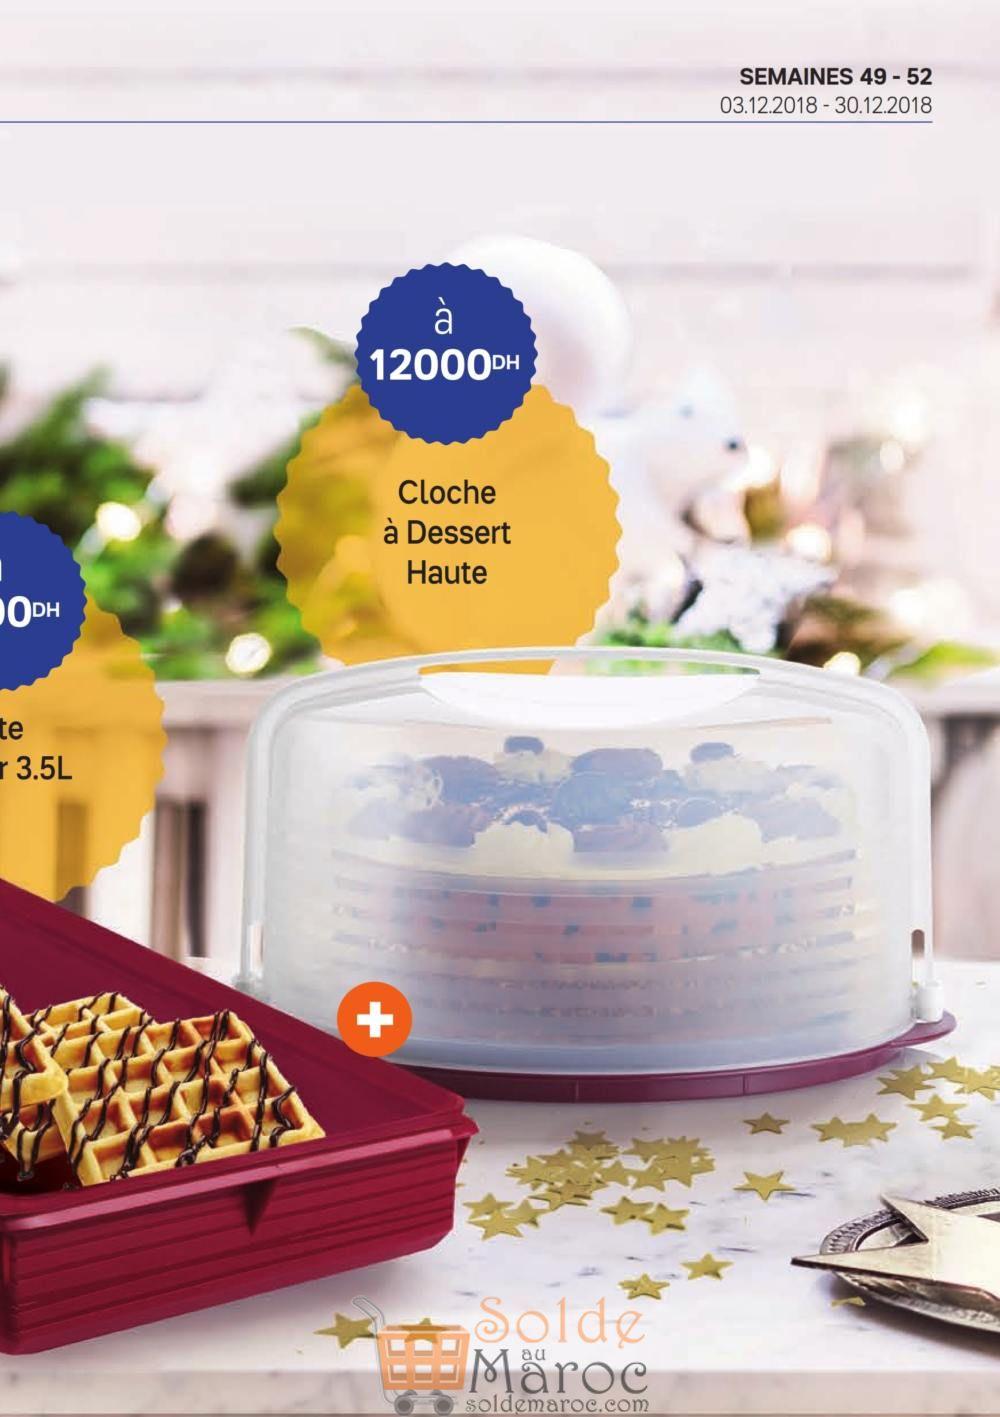 Catalogue Tupperware Maroc Cadeau de recrutement Jusqu'au 30 Décembre 2018